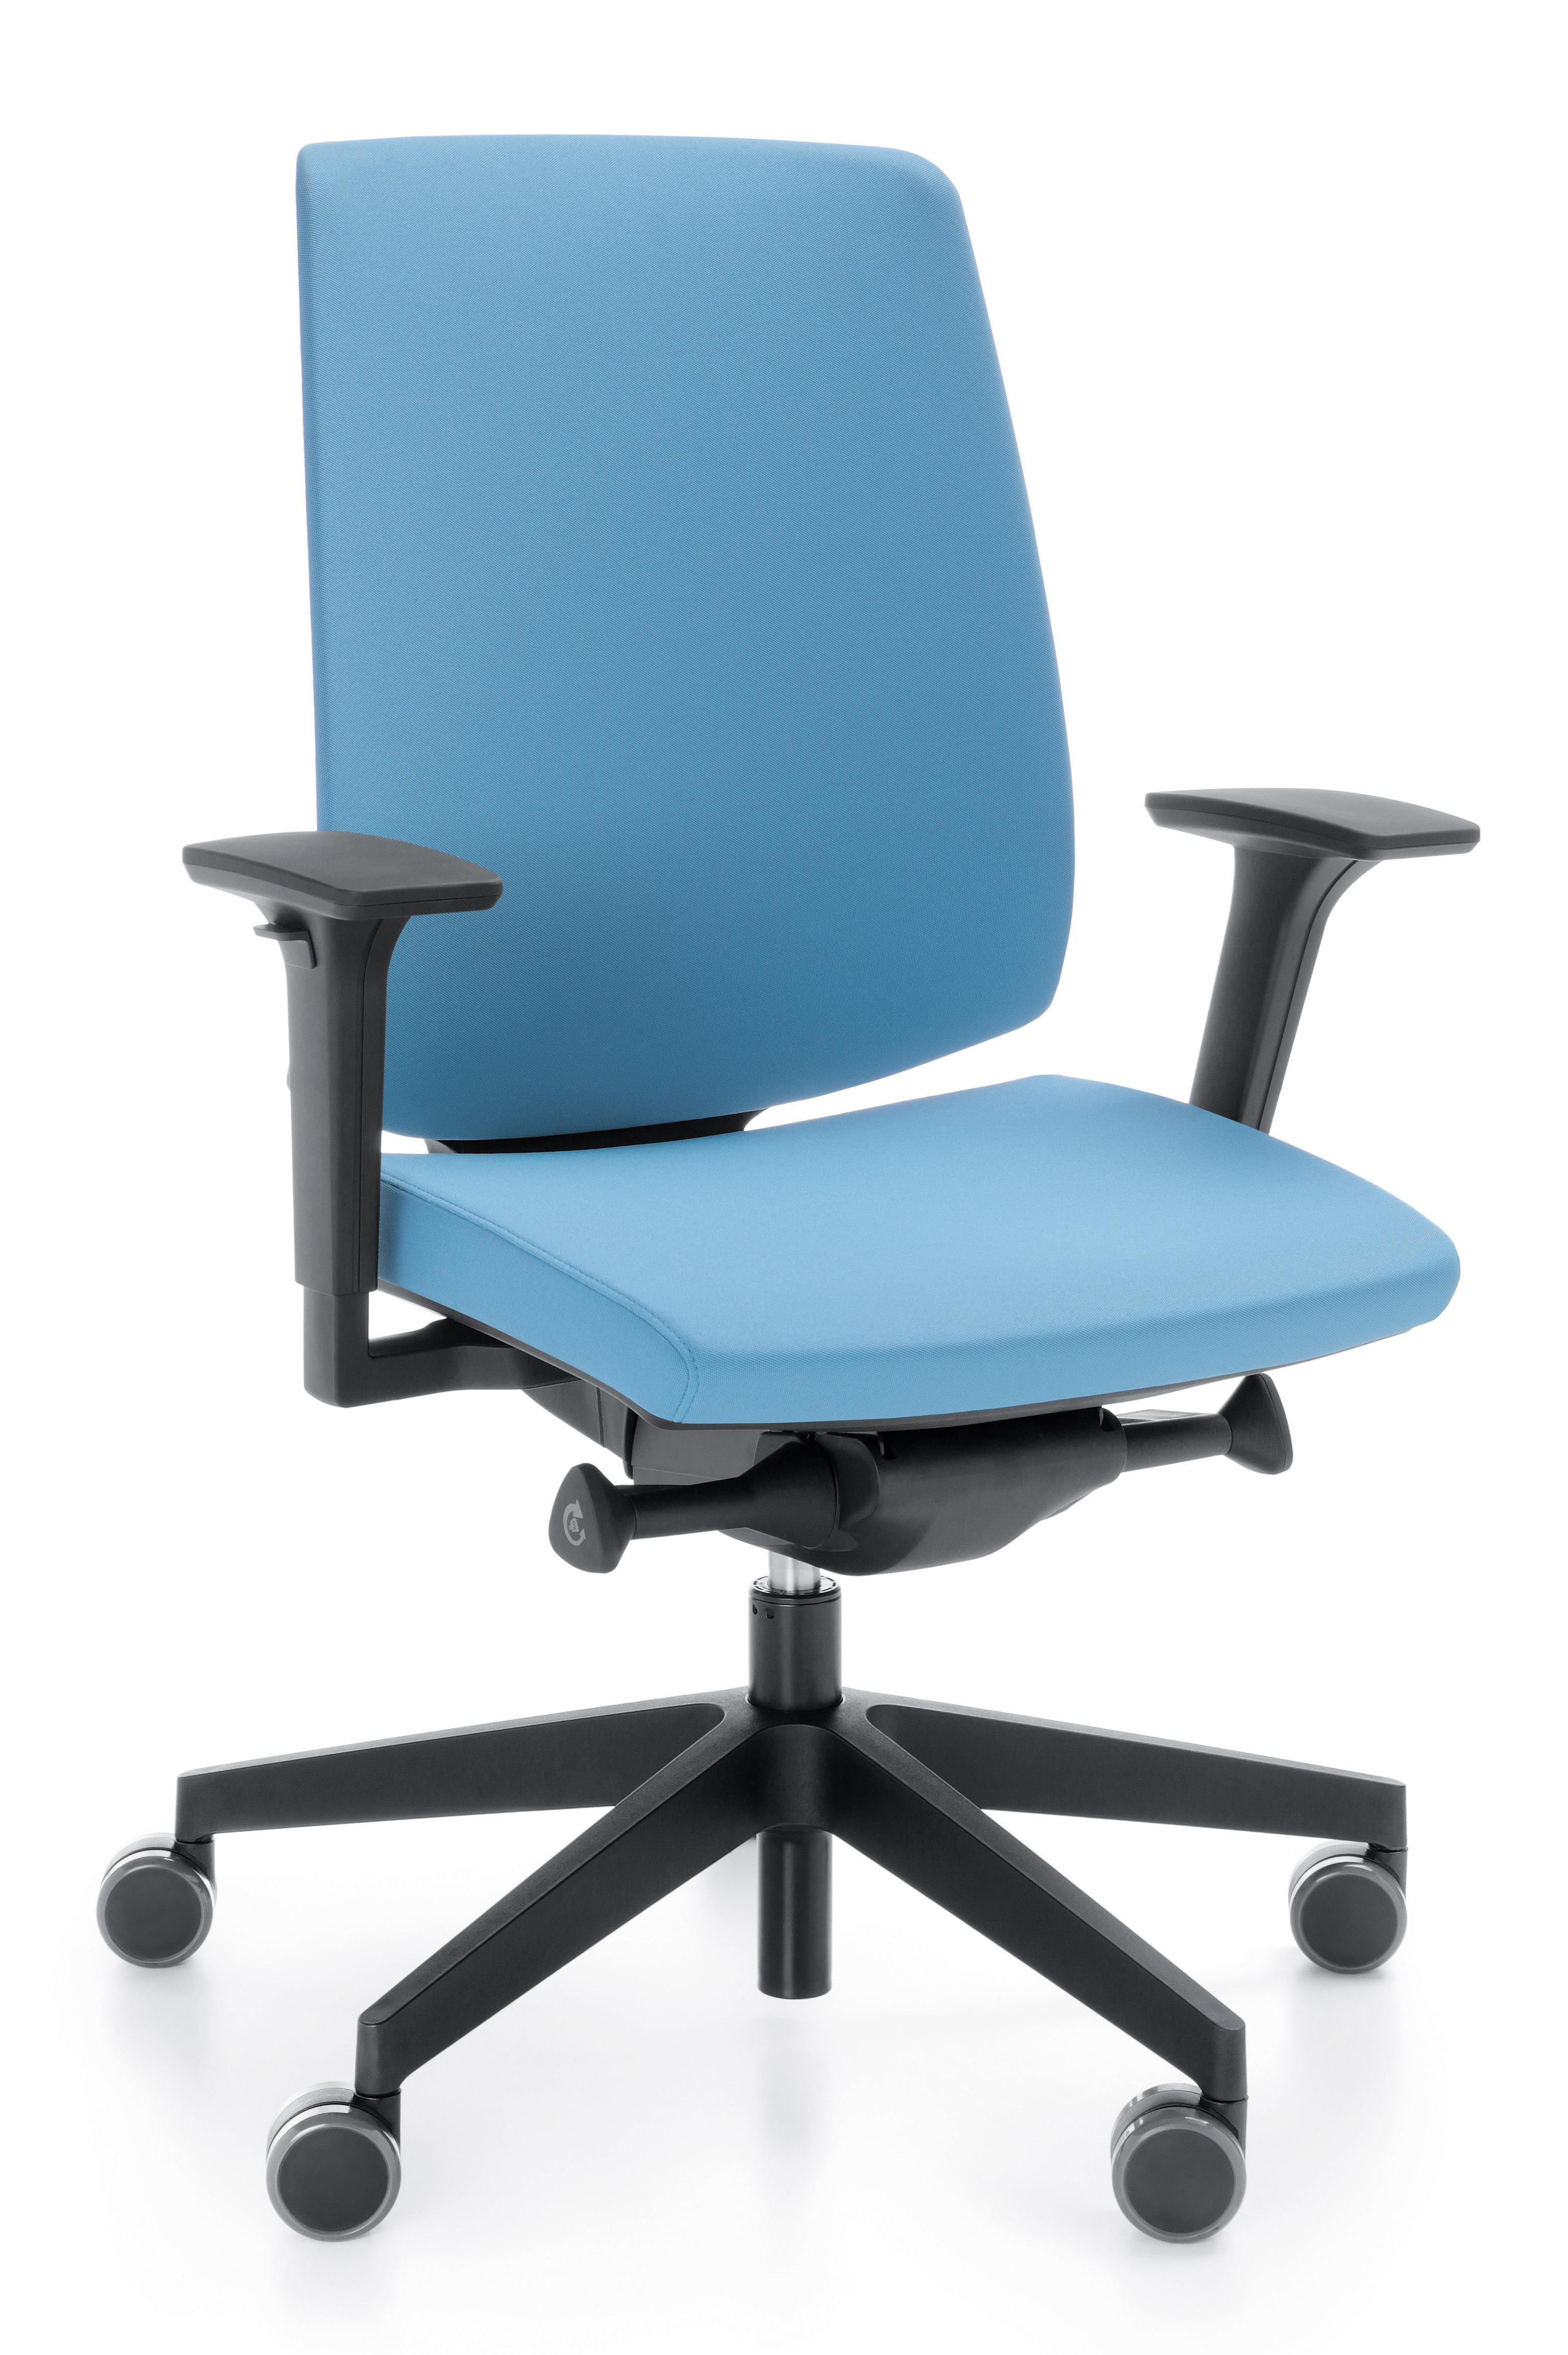 Fotel obrotowy lightUP 230